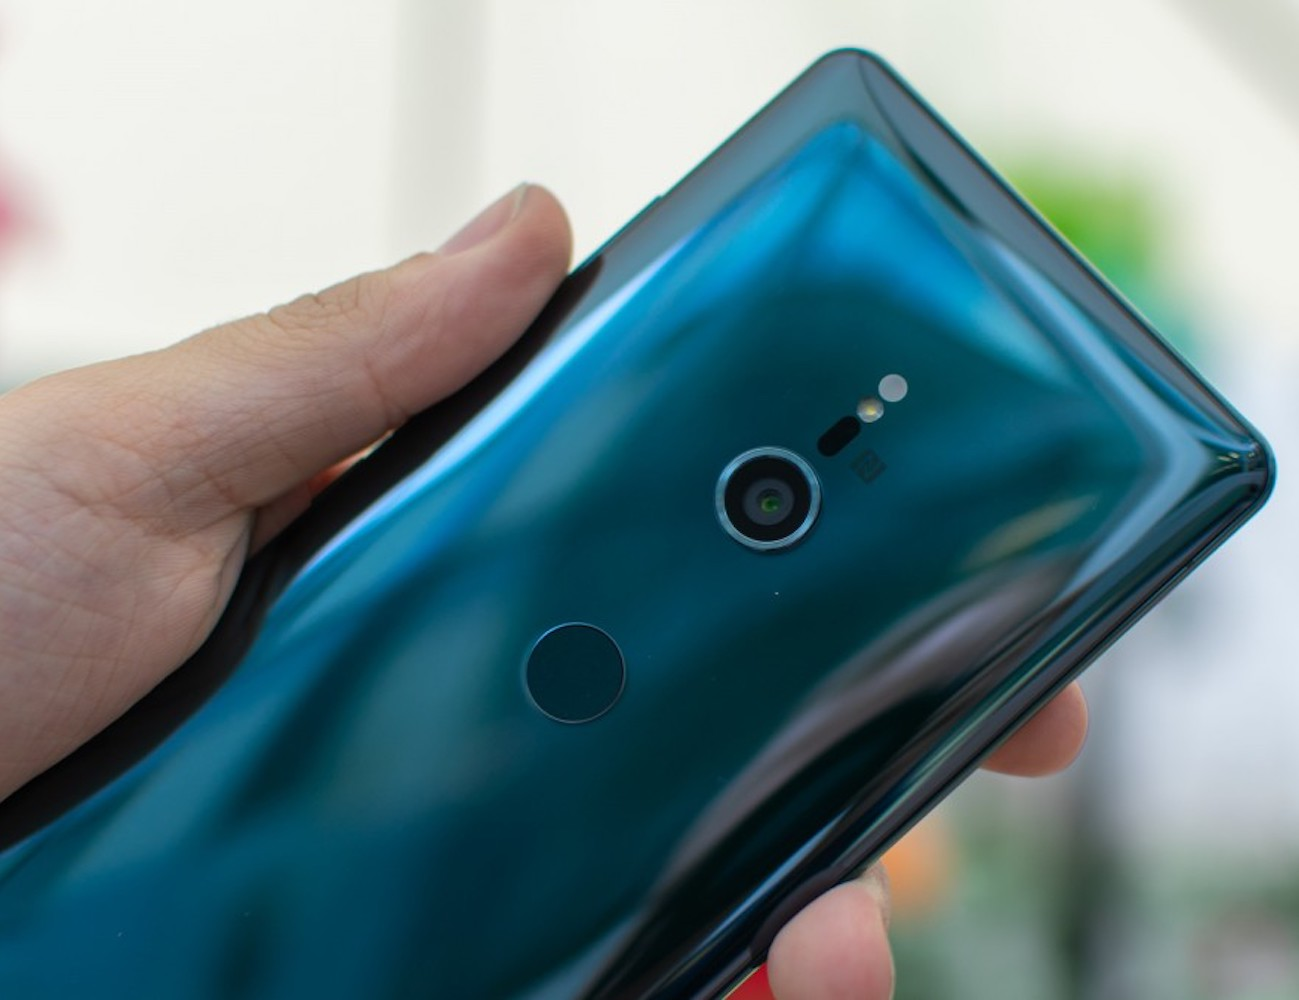 Sony Xperia XZ3 HDR OLED Display Smartphone